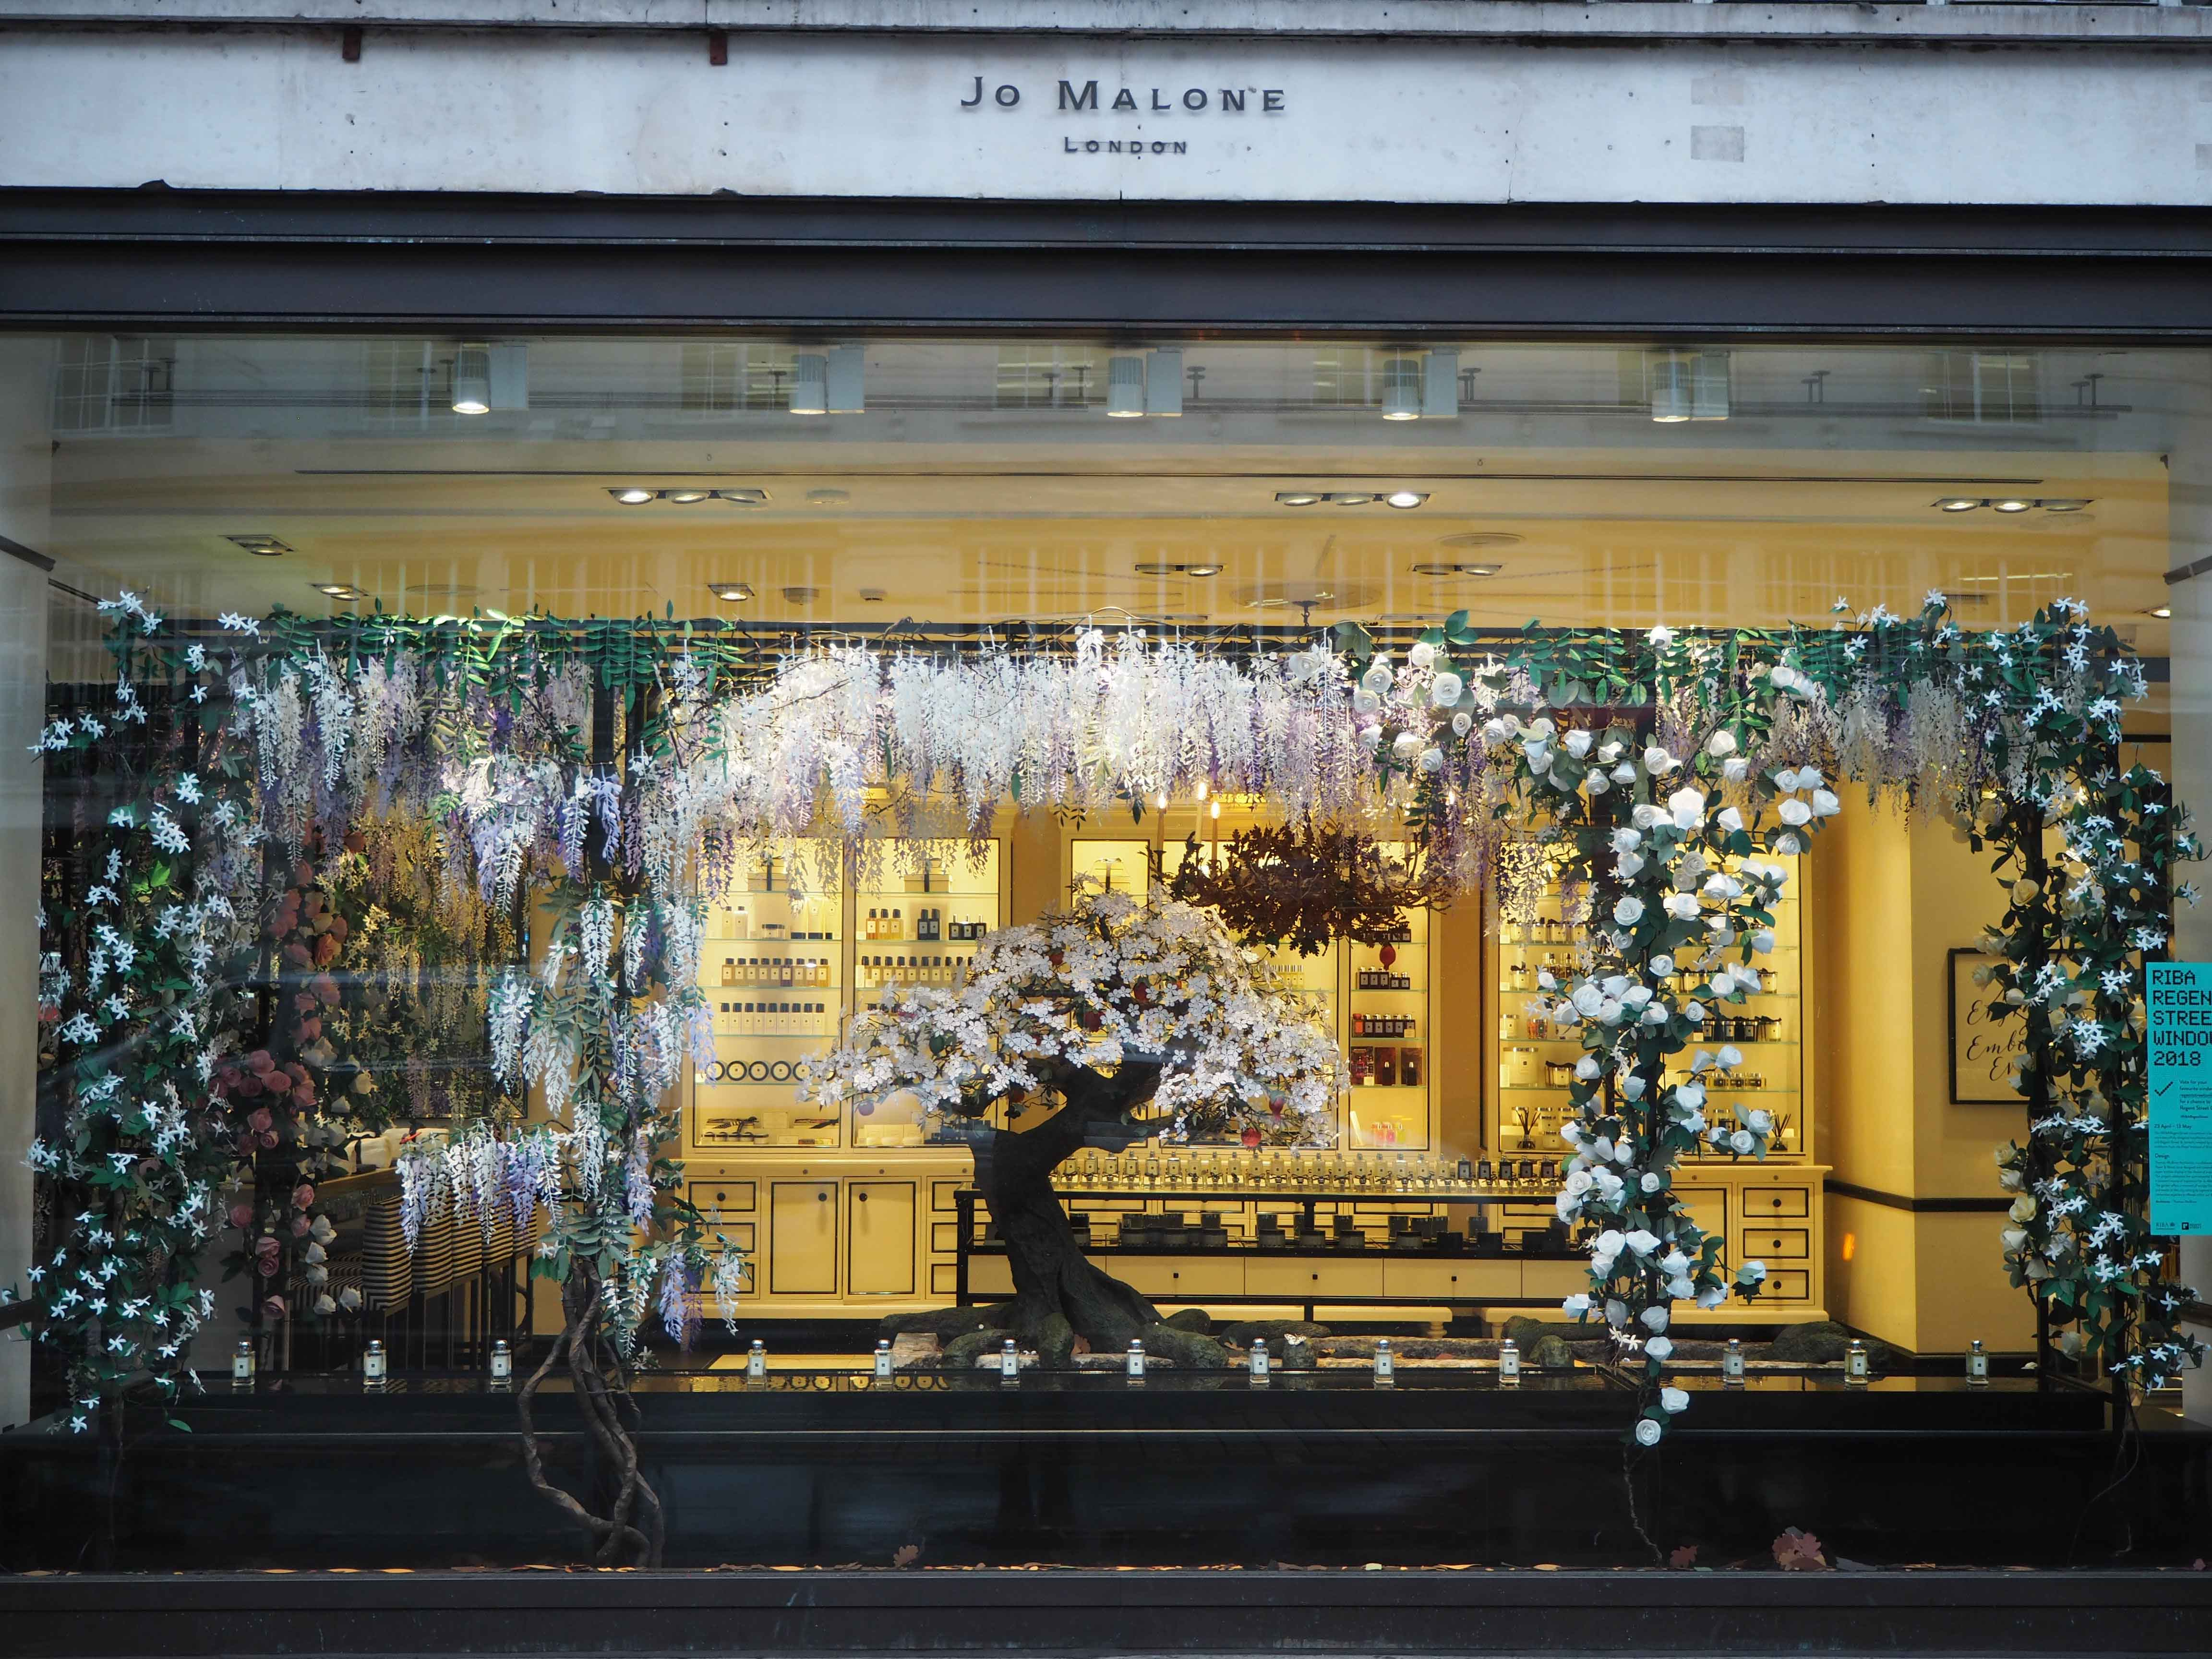 Jo Malone London interior design for visual merchandising of shop window display